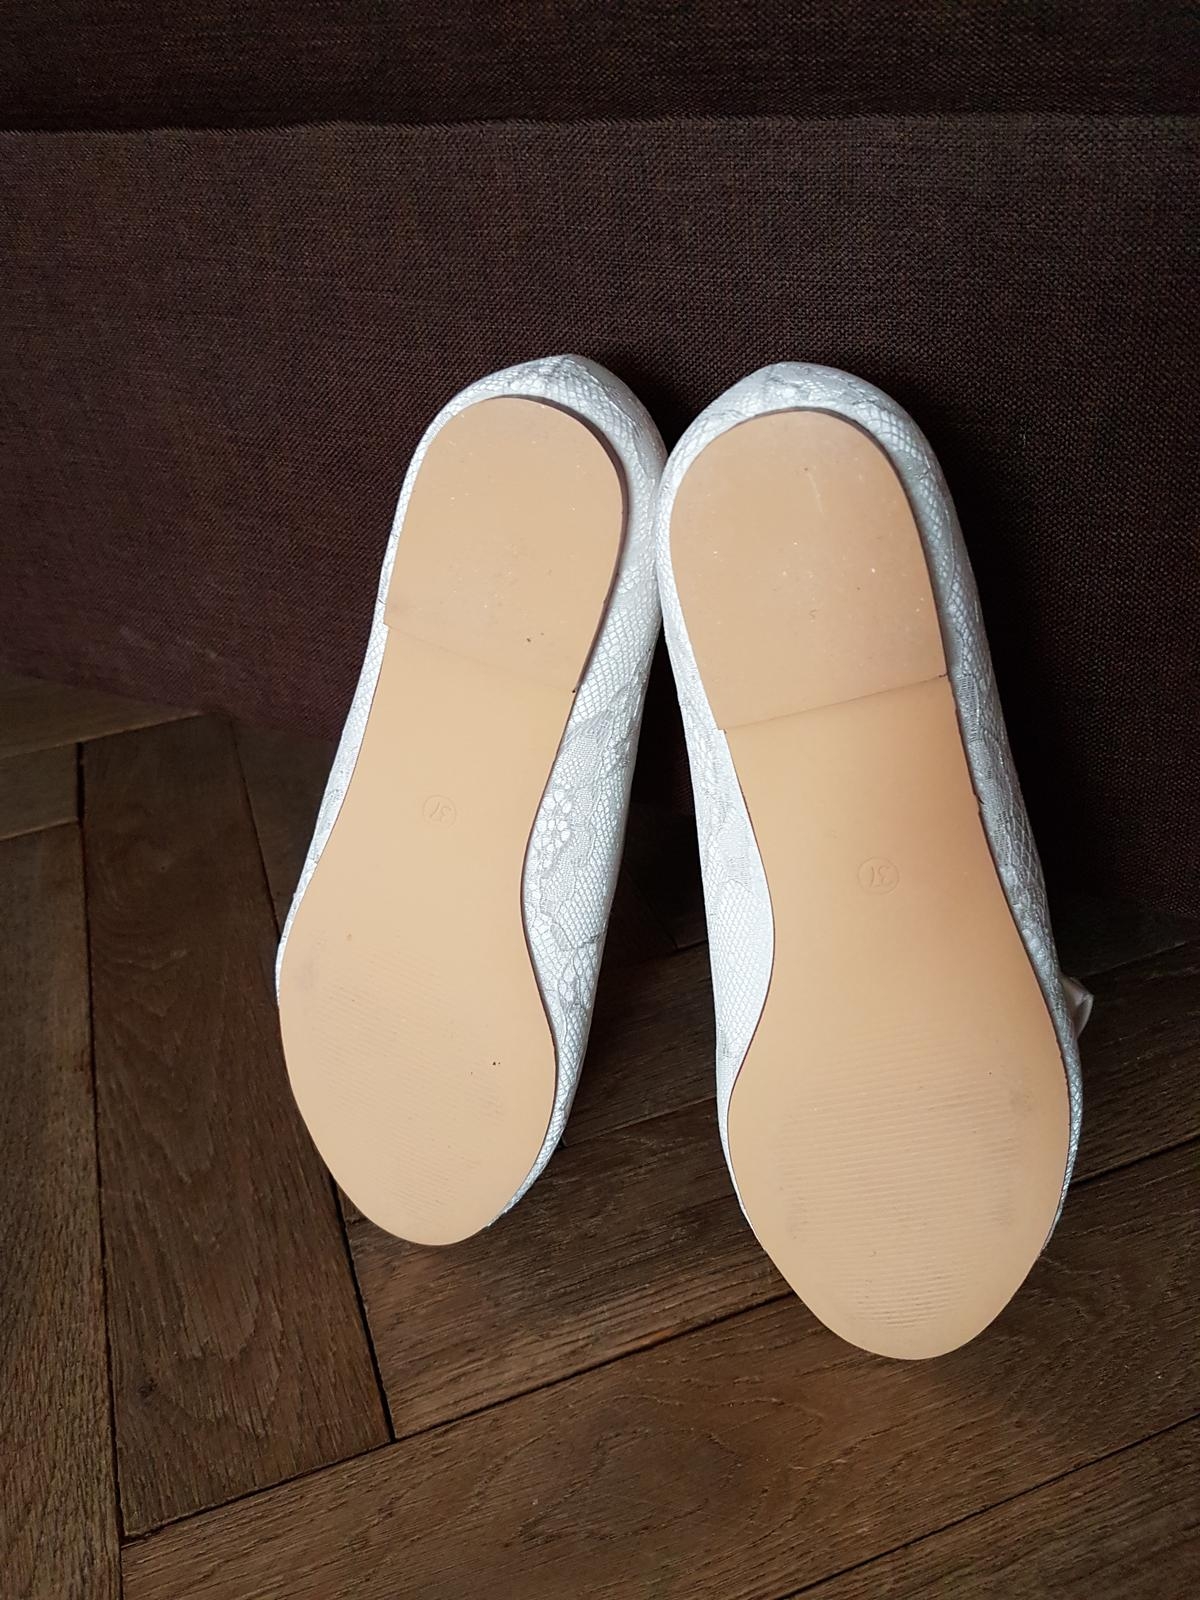 Svadobné balerínky - ivory - Obrázok č. 3